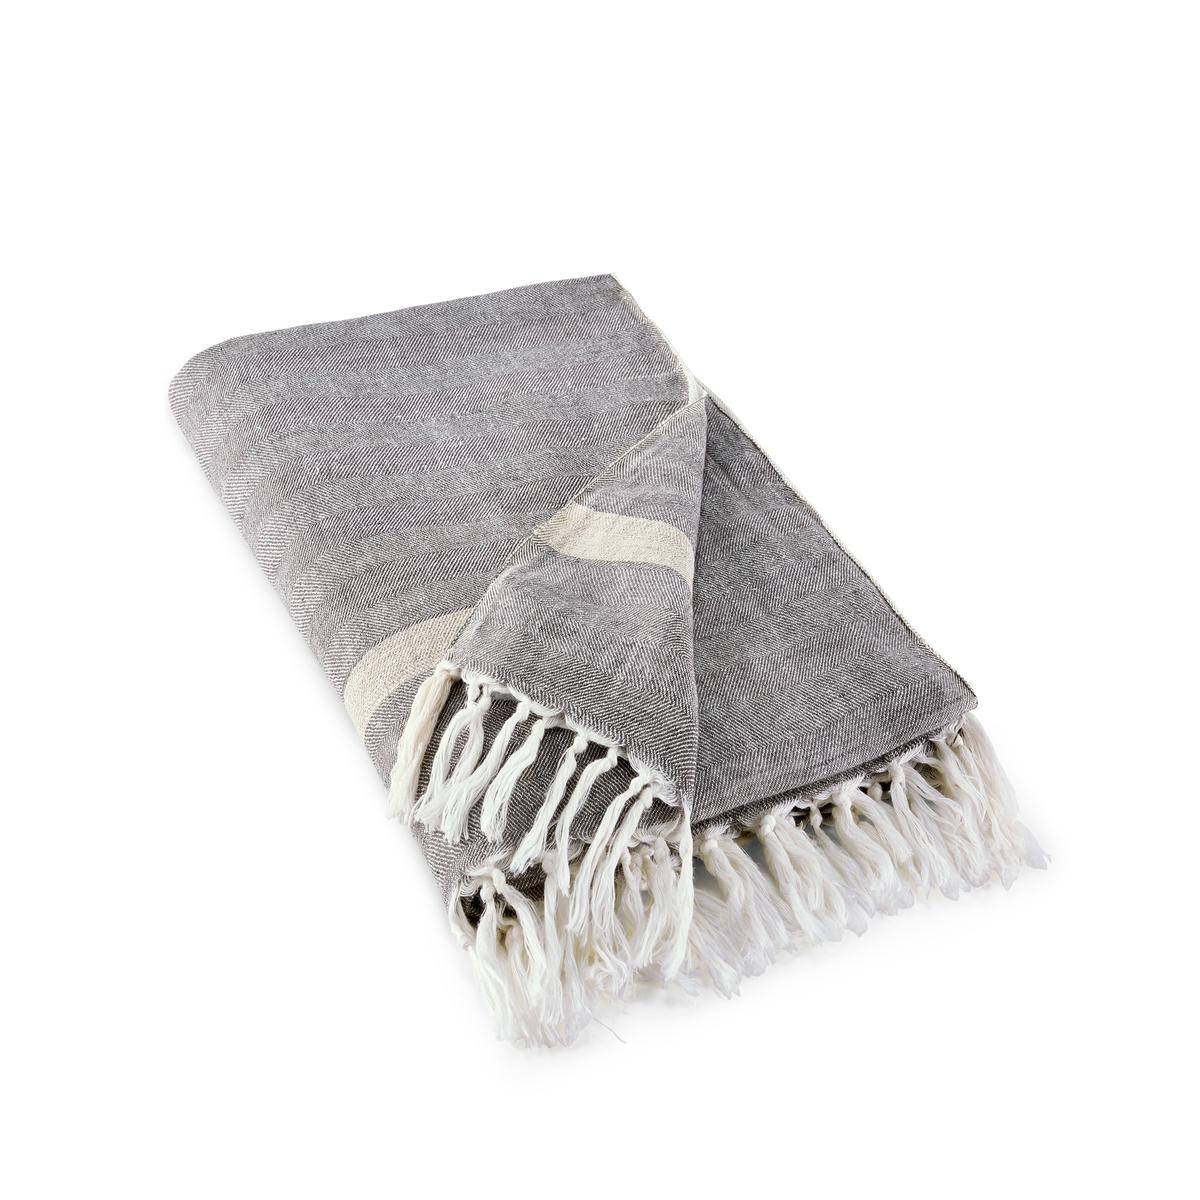 цена на Плед La Redoute Из ткани шамбре из льна Pokoba 130 x 170 см серый